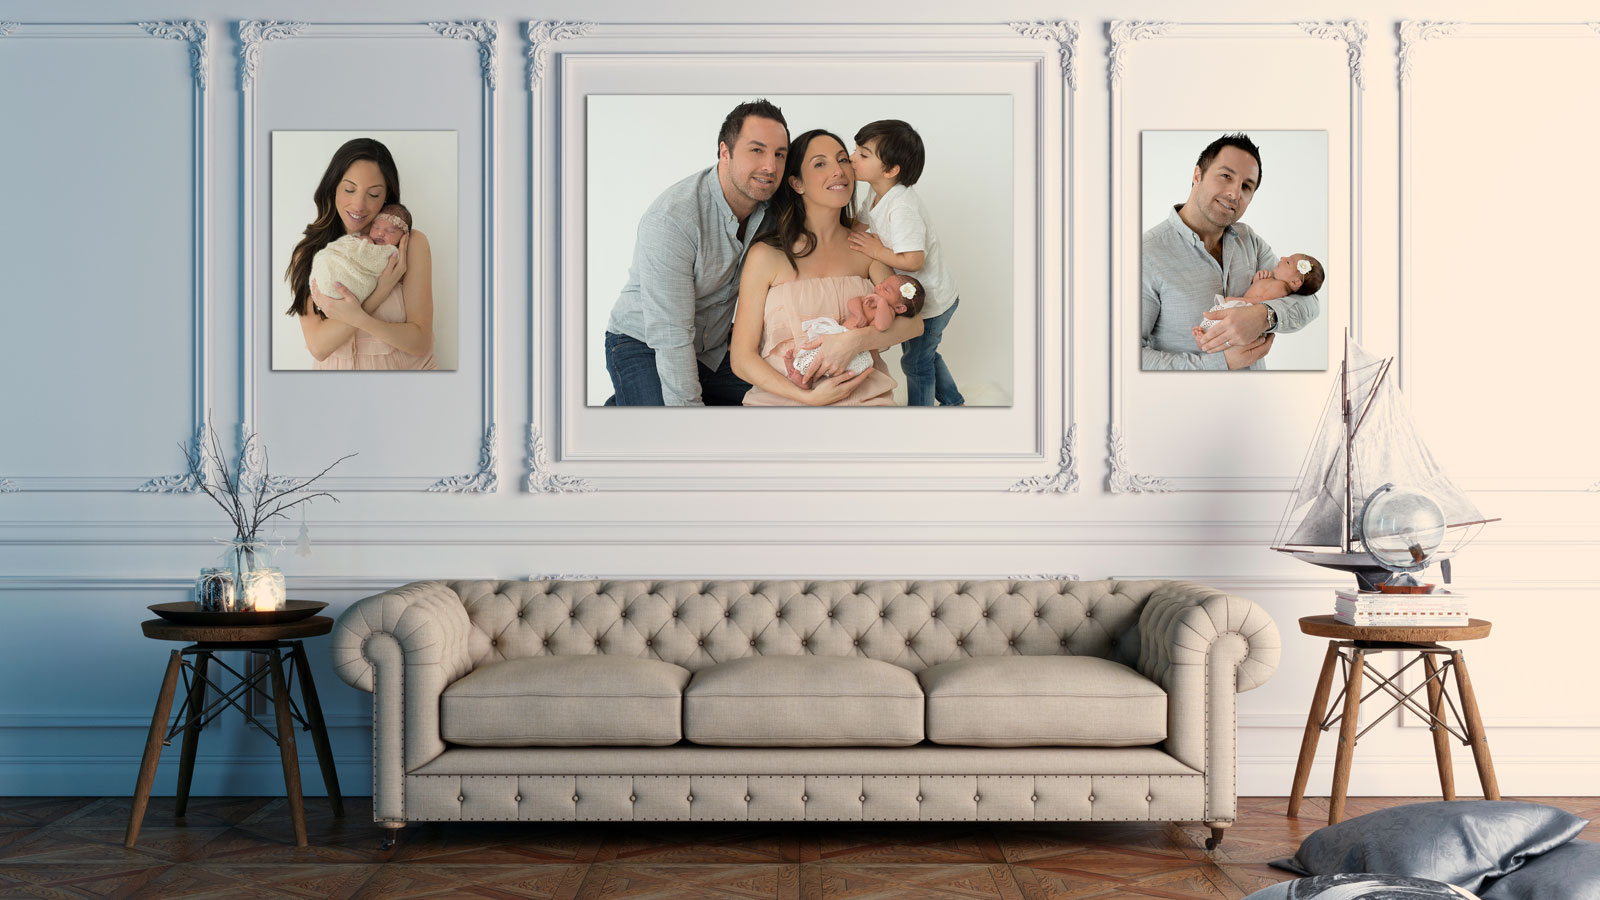 Kay's Photography Studio